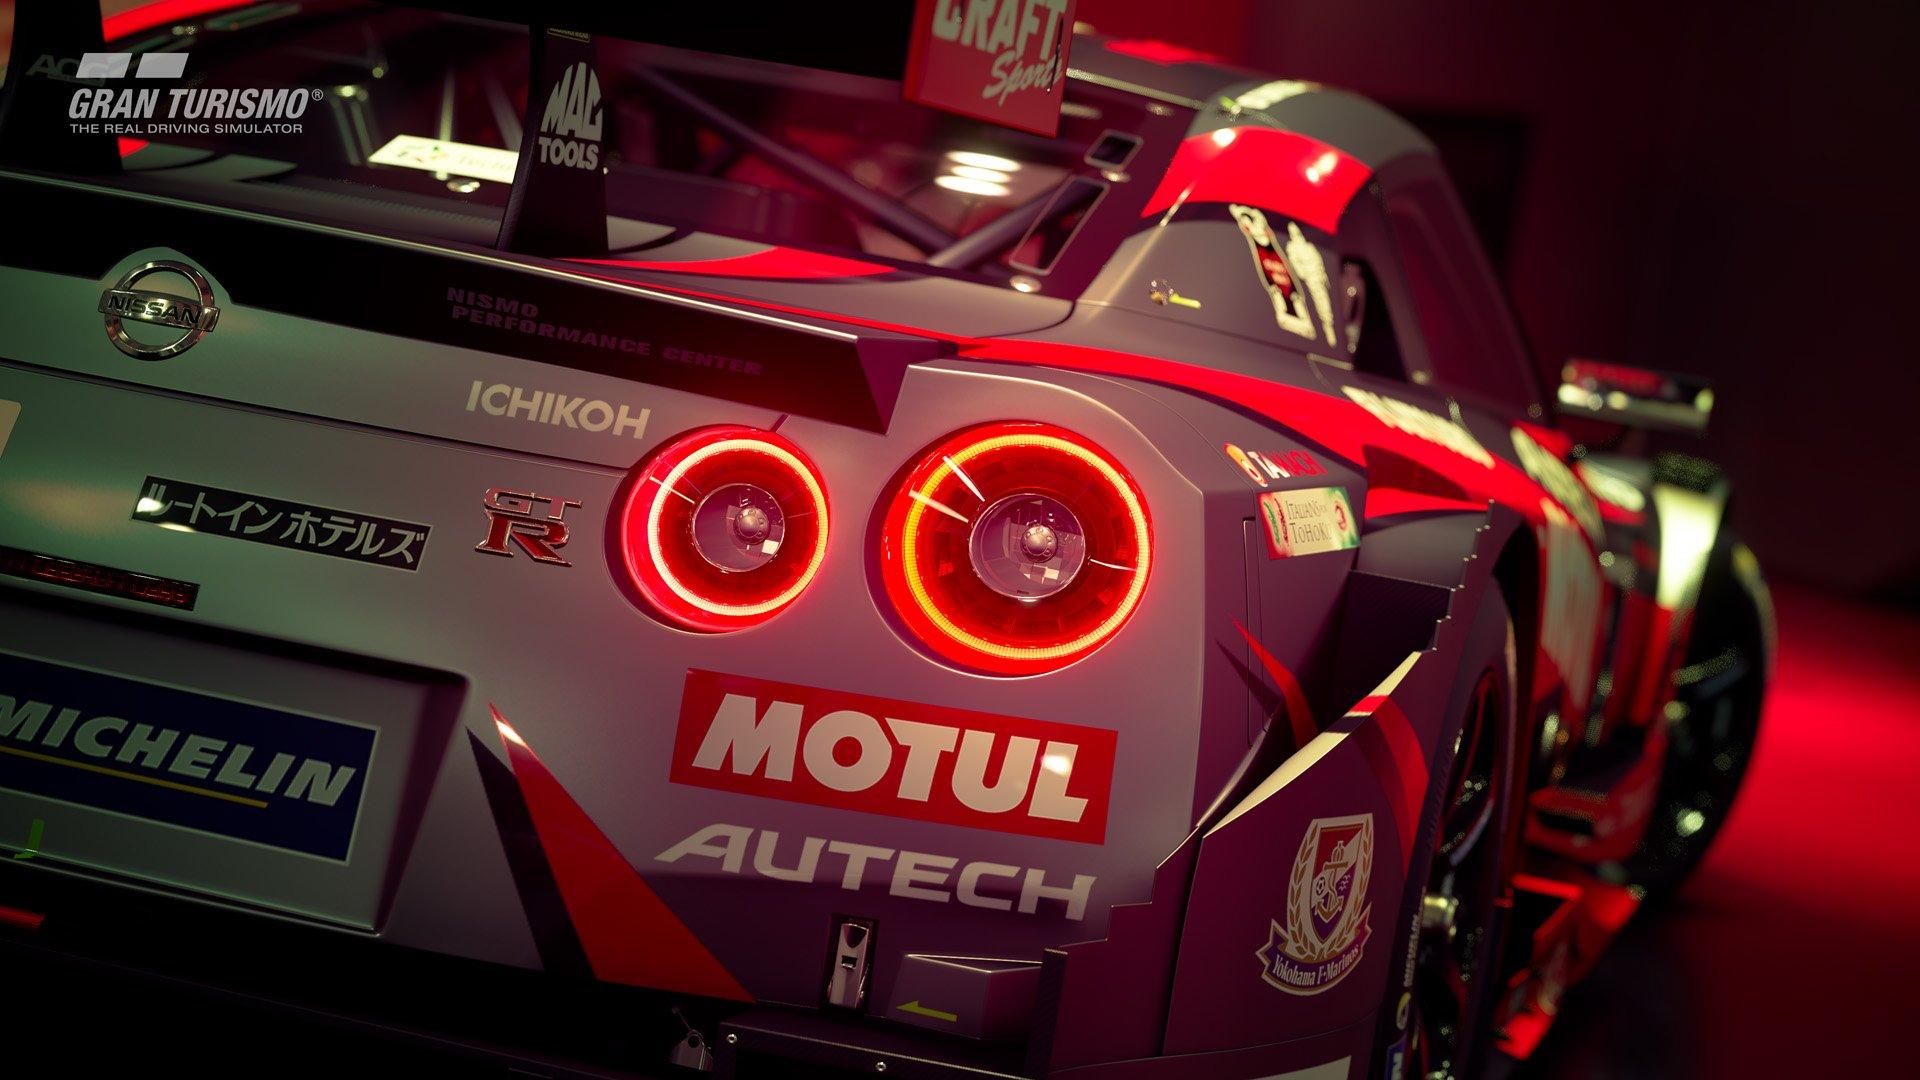 Gran Turismo Sport version 1.15 Nissan MOTUL AUTECH GT-R '16 (Gr.2) 2